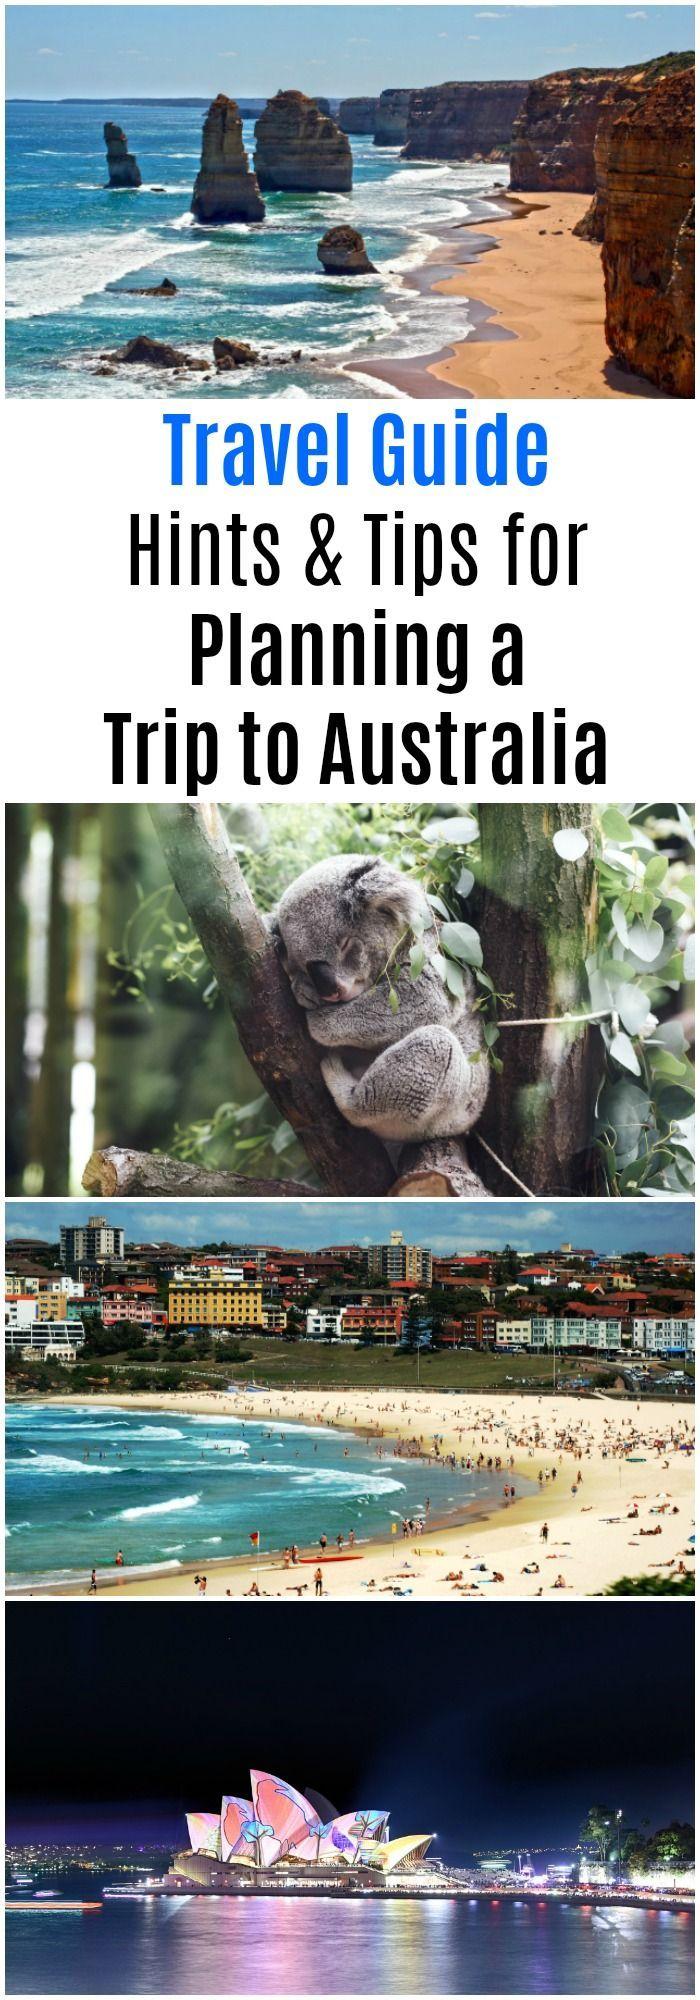 Travel Guide Hints & Tips for Planning a Trip to Australia #Australia #TravelAdvice #TravelTips